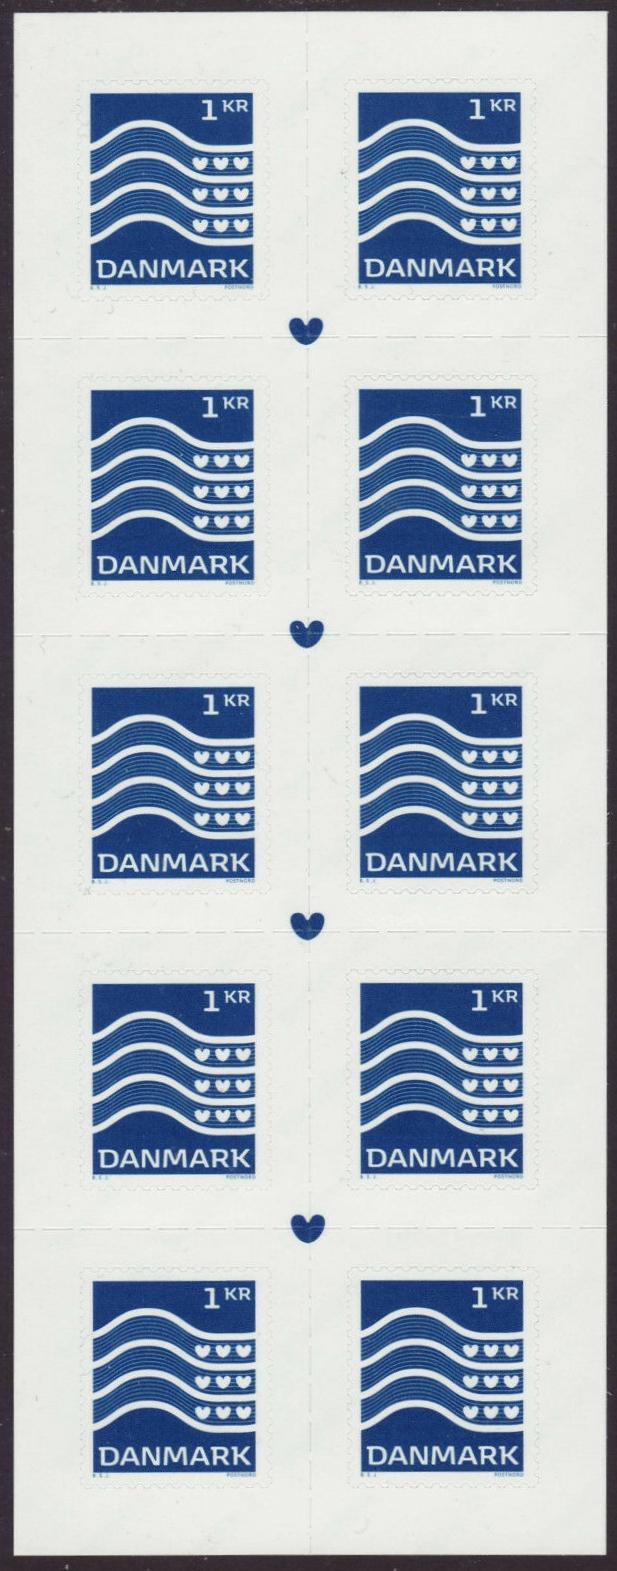 Denmark - Wavy Lines & Hearts definitive (January 2, 2019) booklet pane of 10